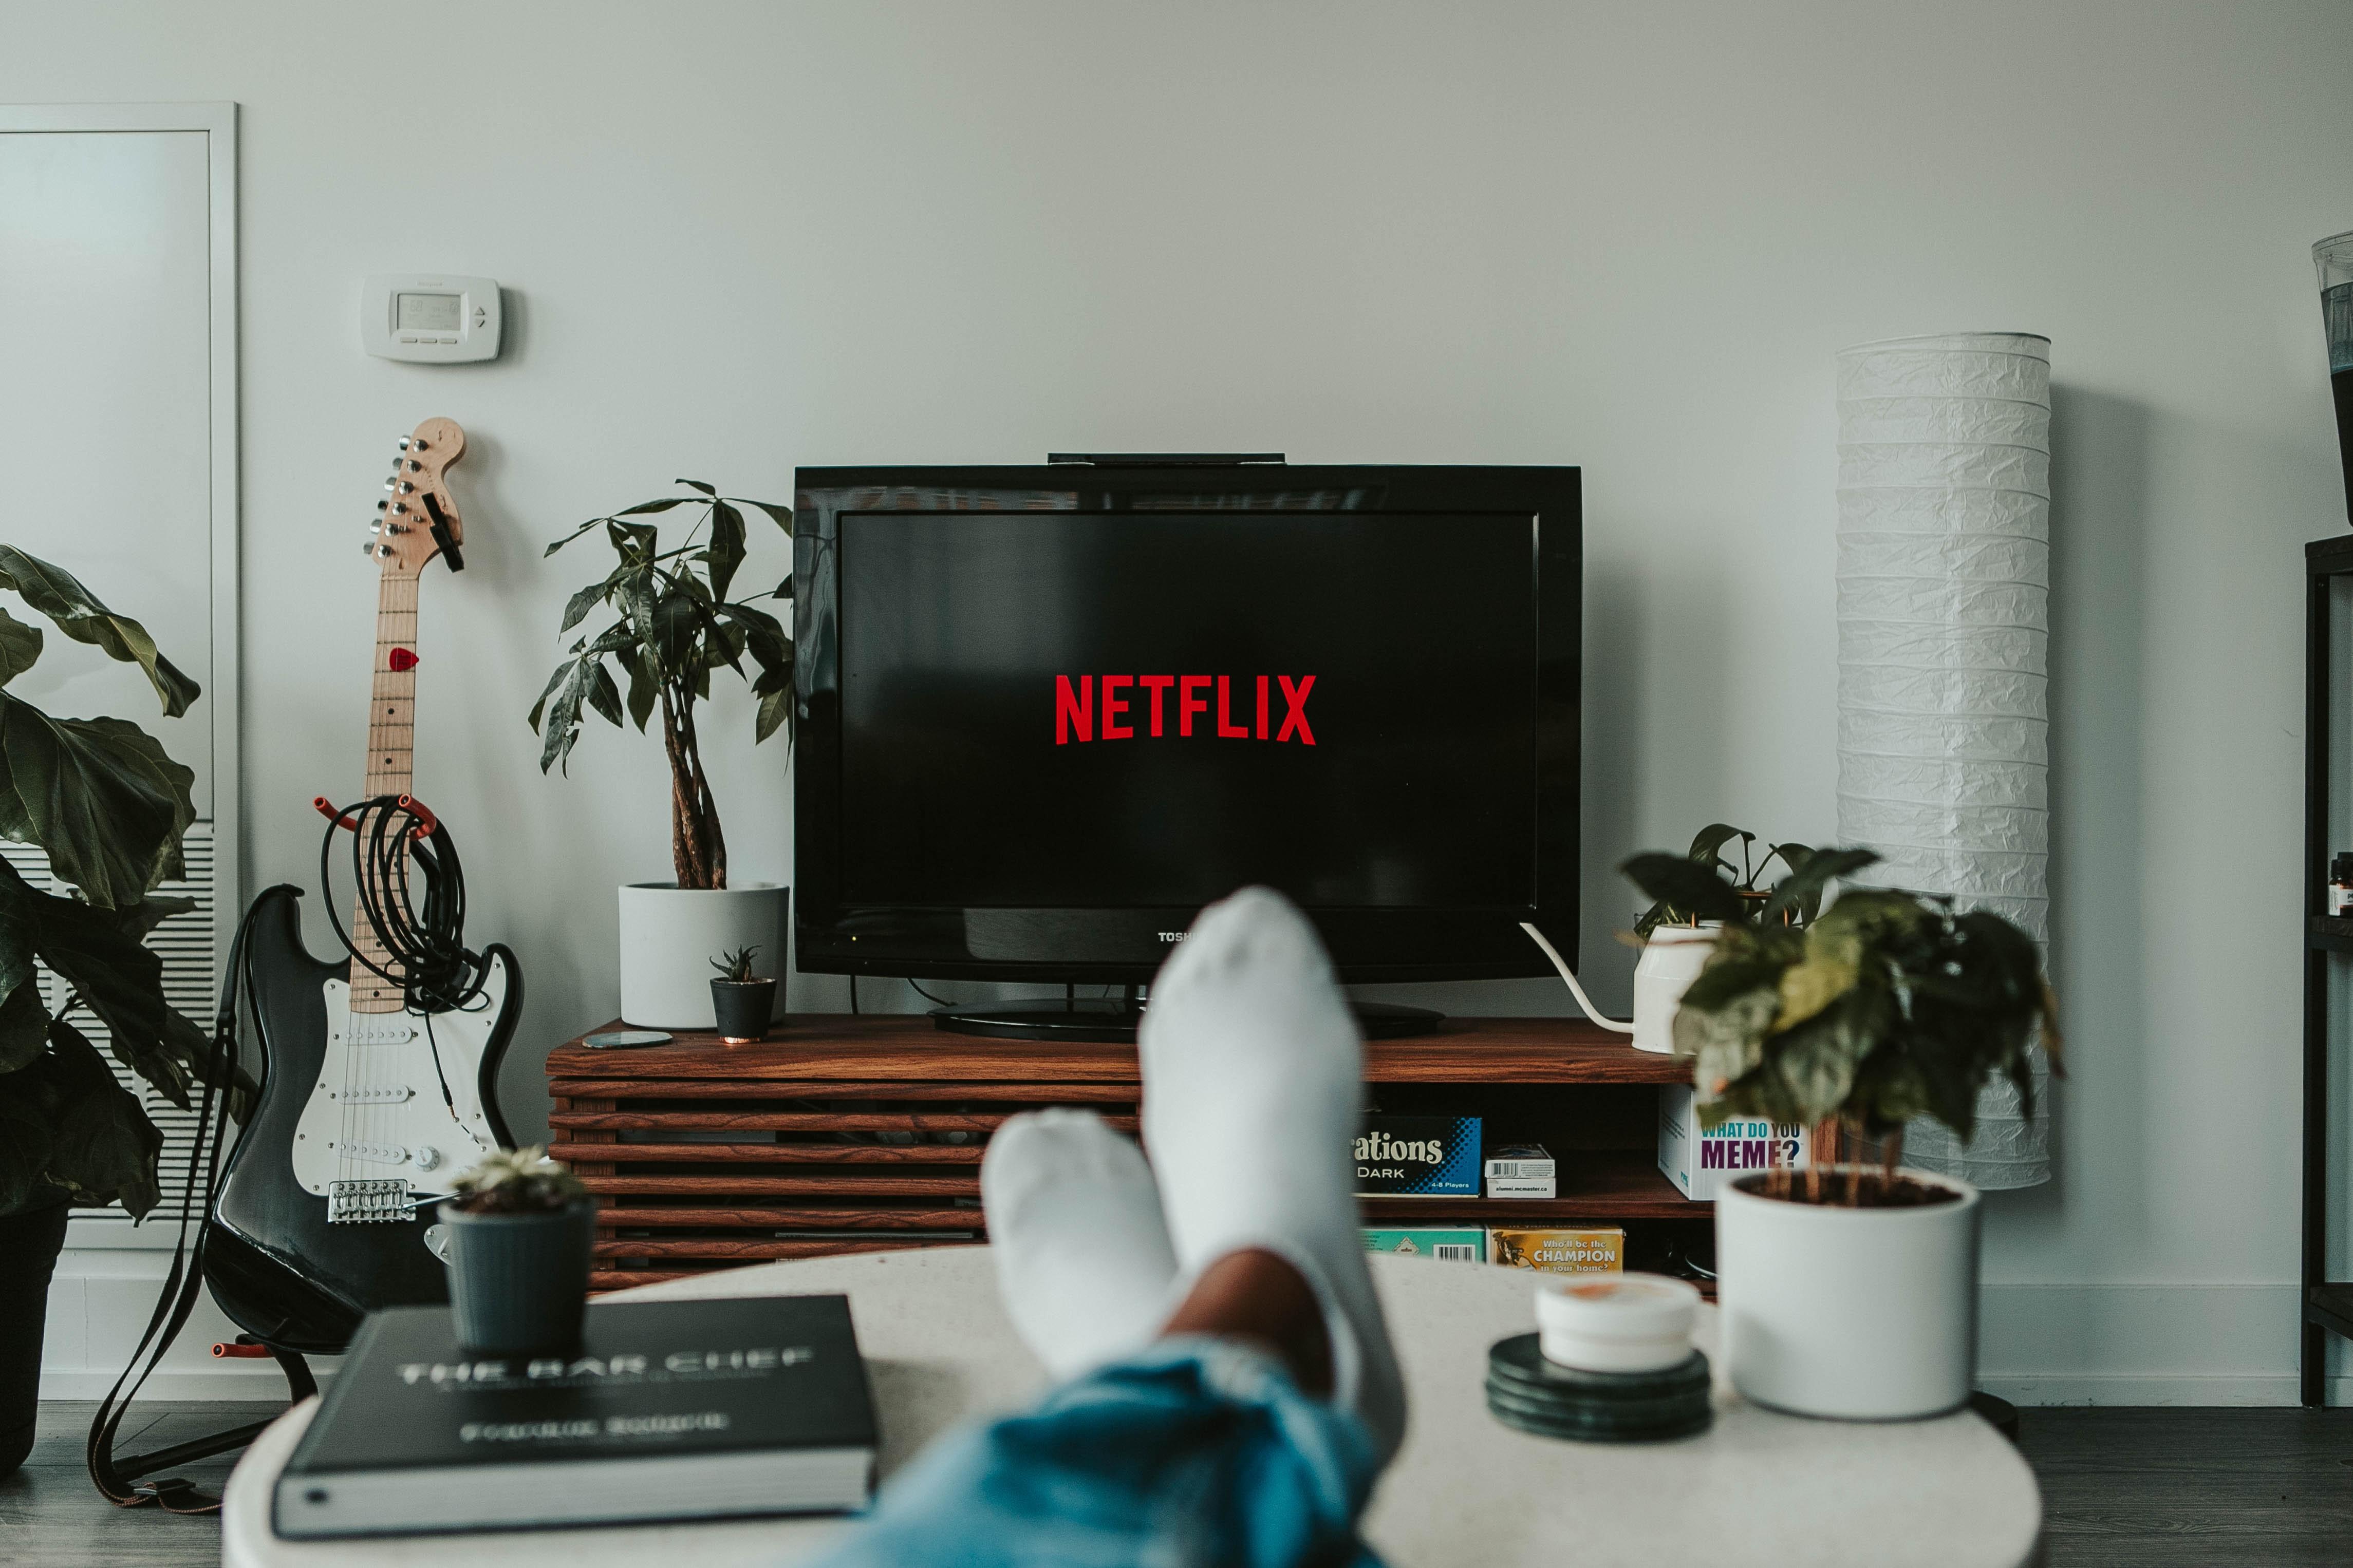 black flat screen turned on to Netflix logo